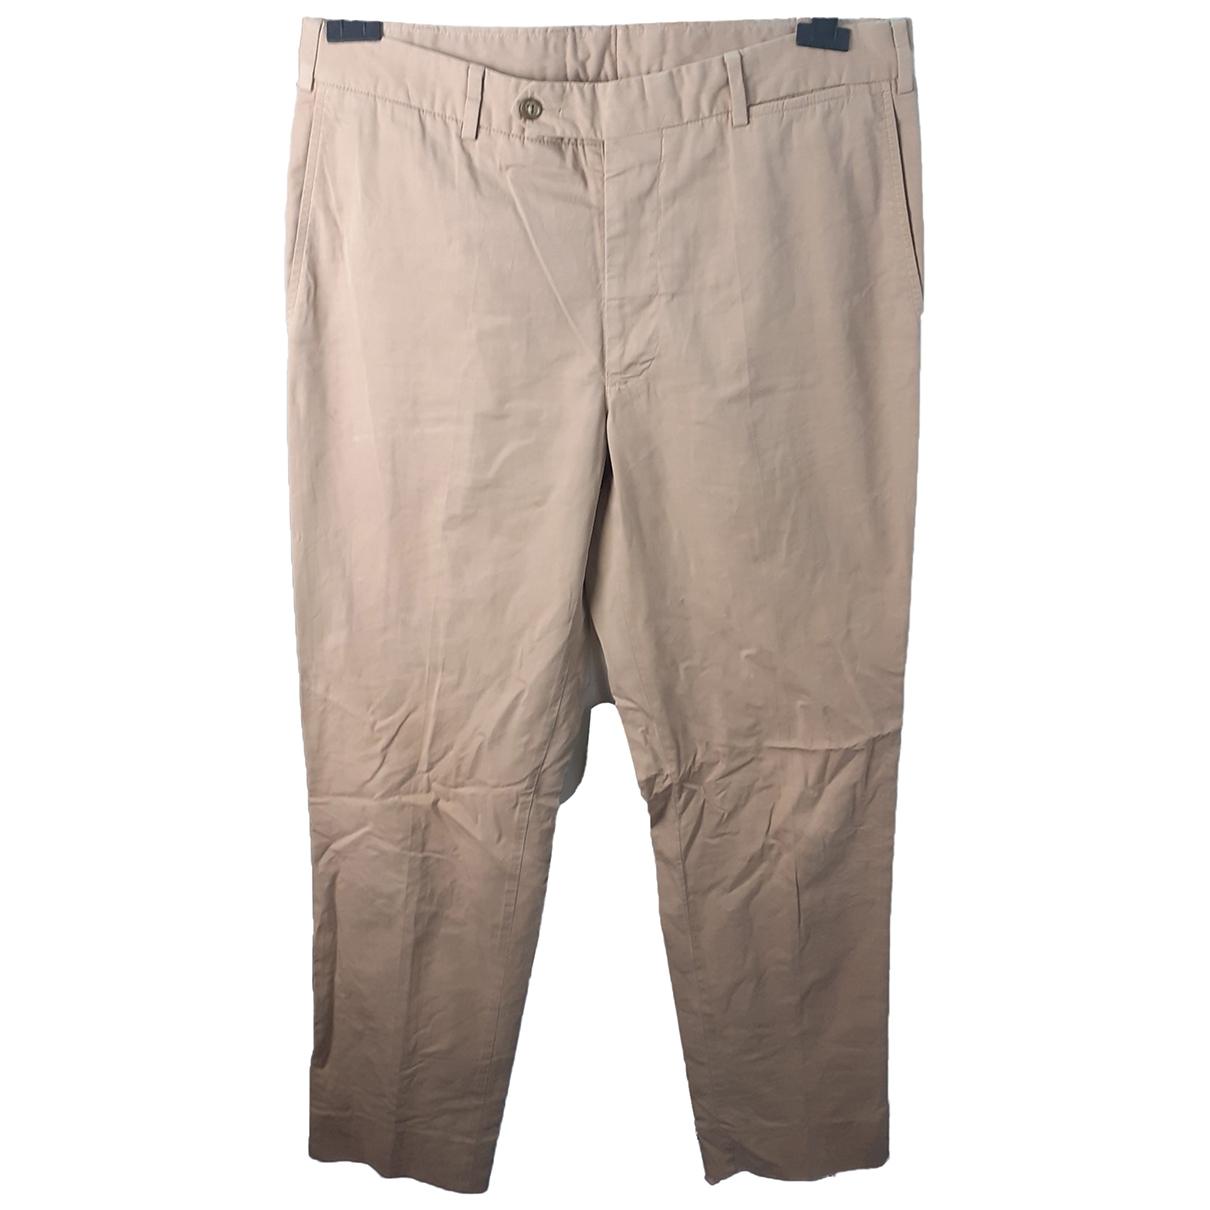 Pantalones en Algodon Beige Burberry